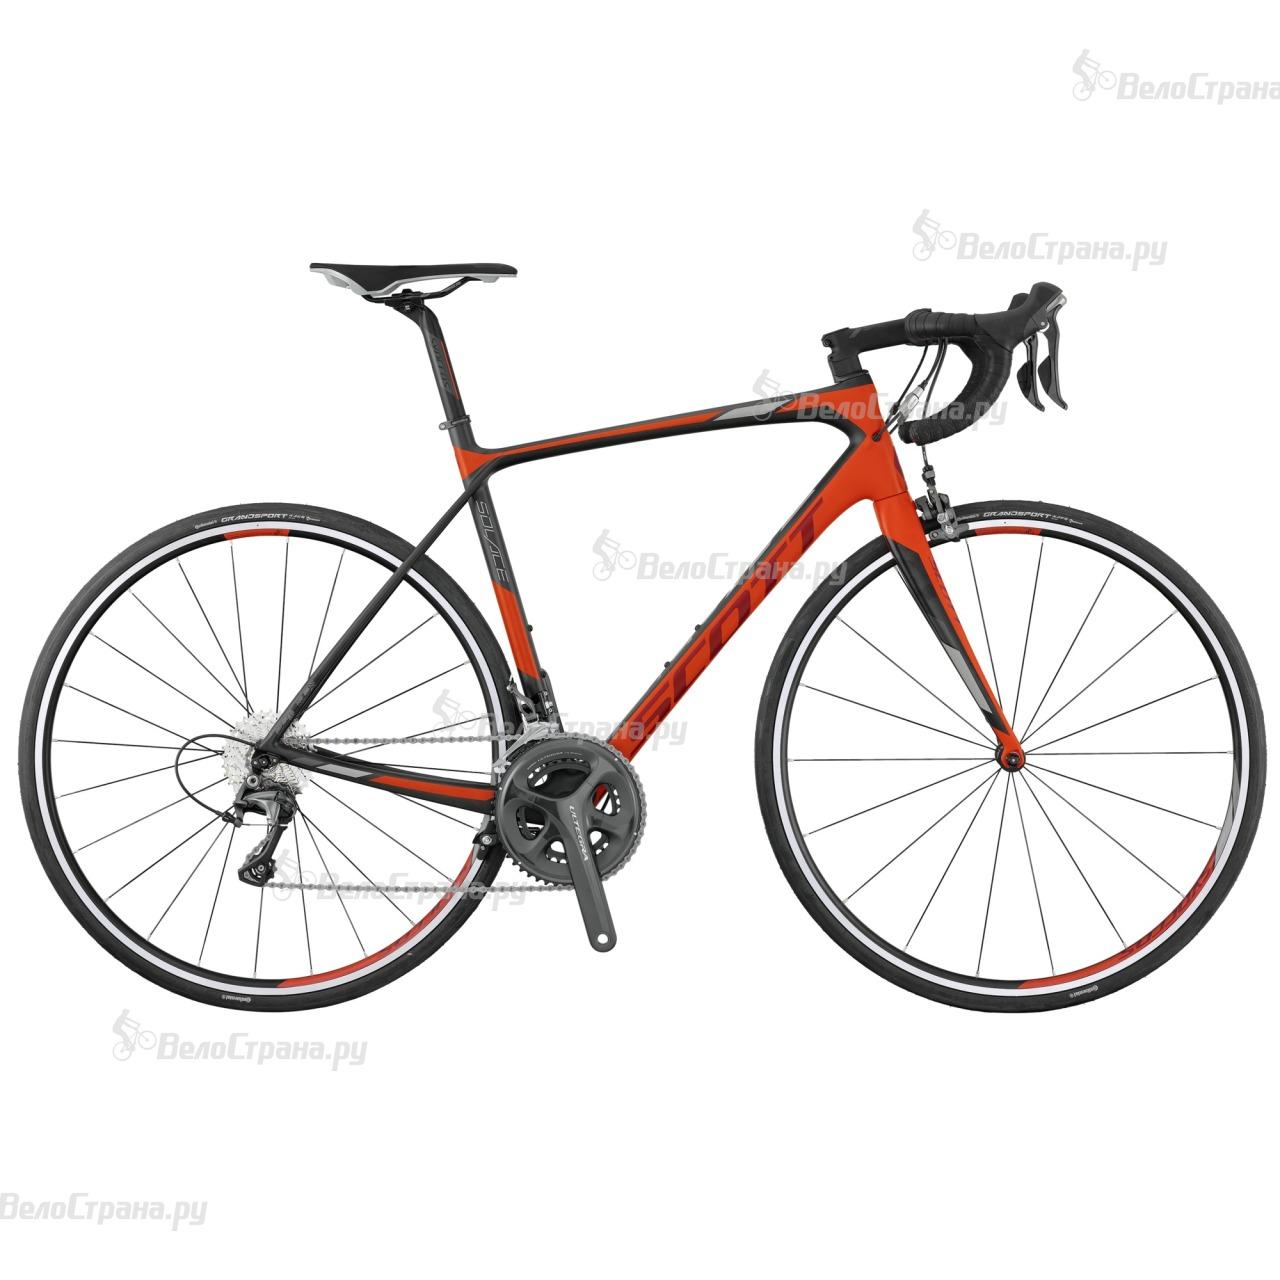 Велосипед Scott Solace 10 Disc (2017) велосипед scott contessa solace 15 compact 2015